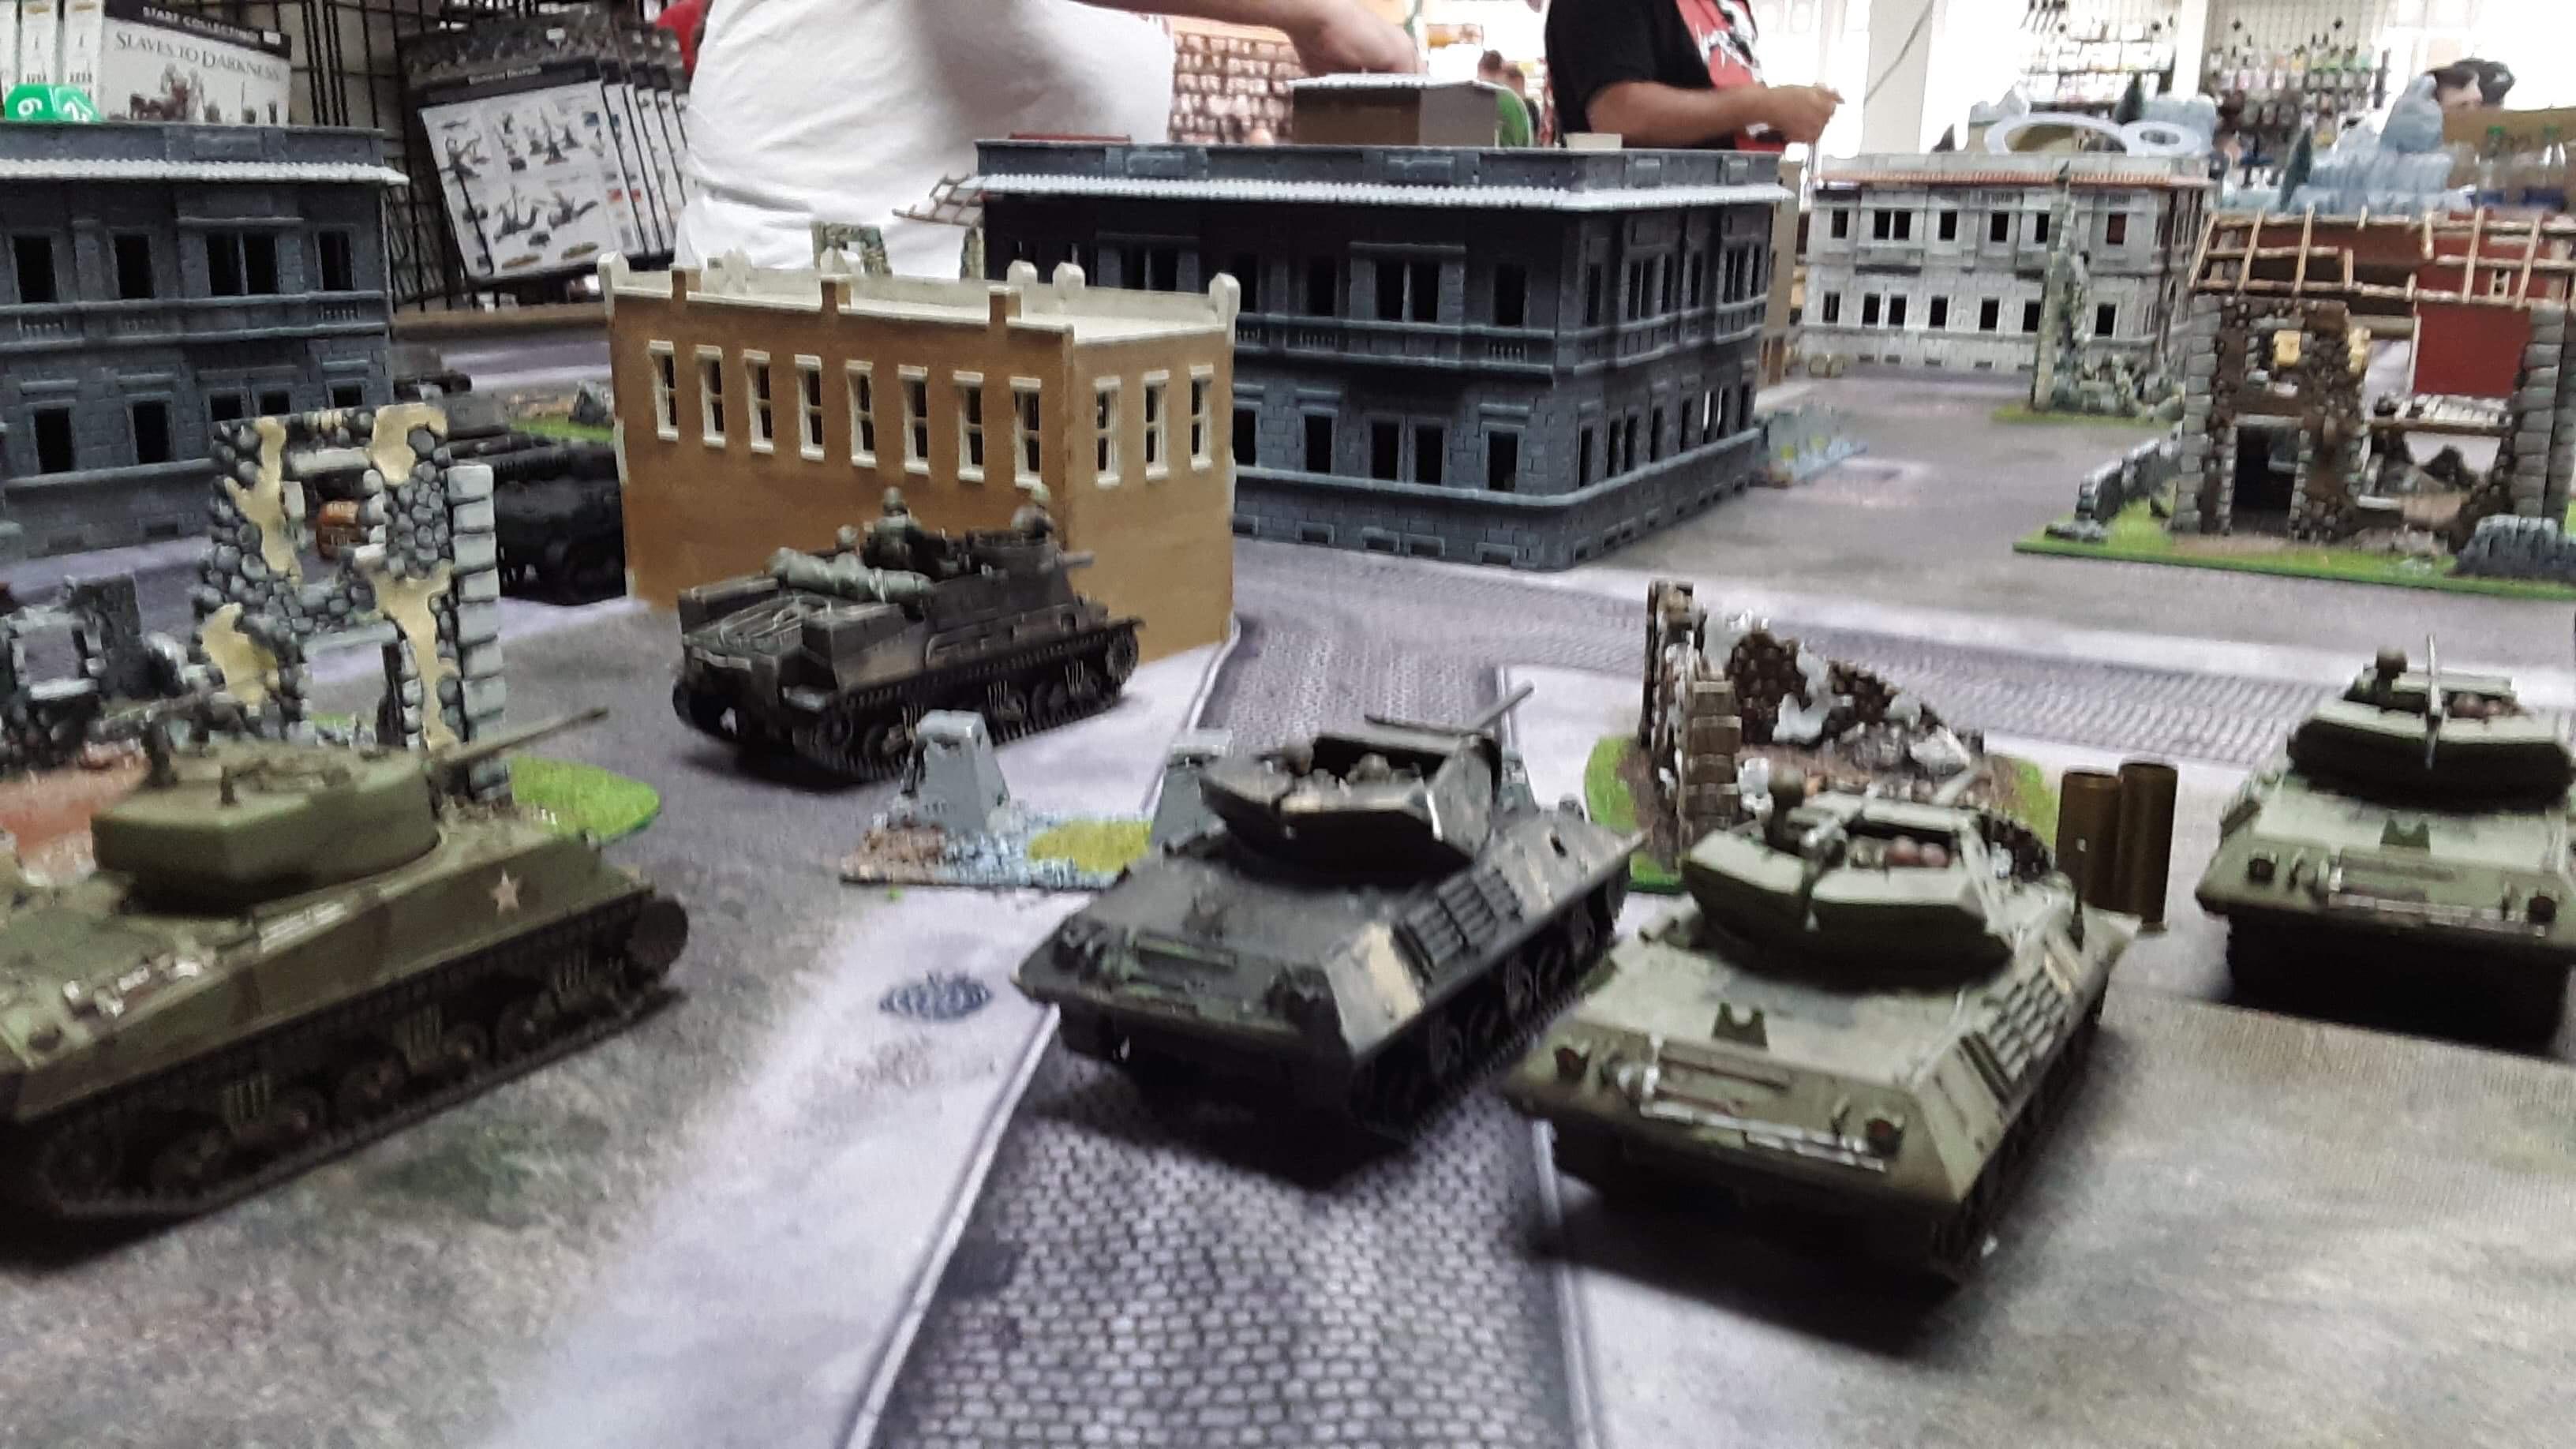 352nd Pionier Battalion versus 289th Infantry Regiment in an armoured engagement